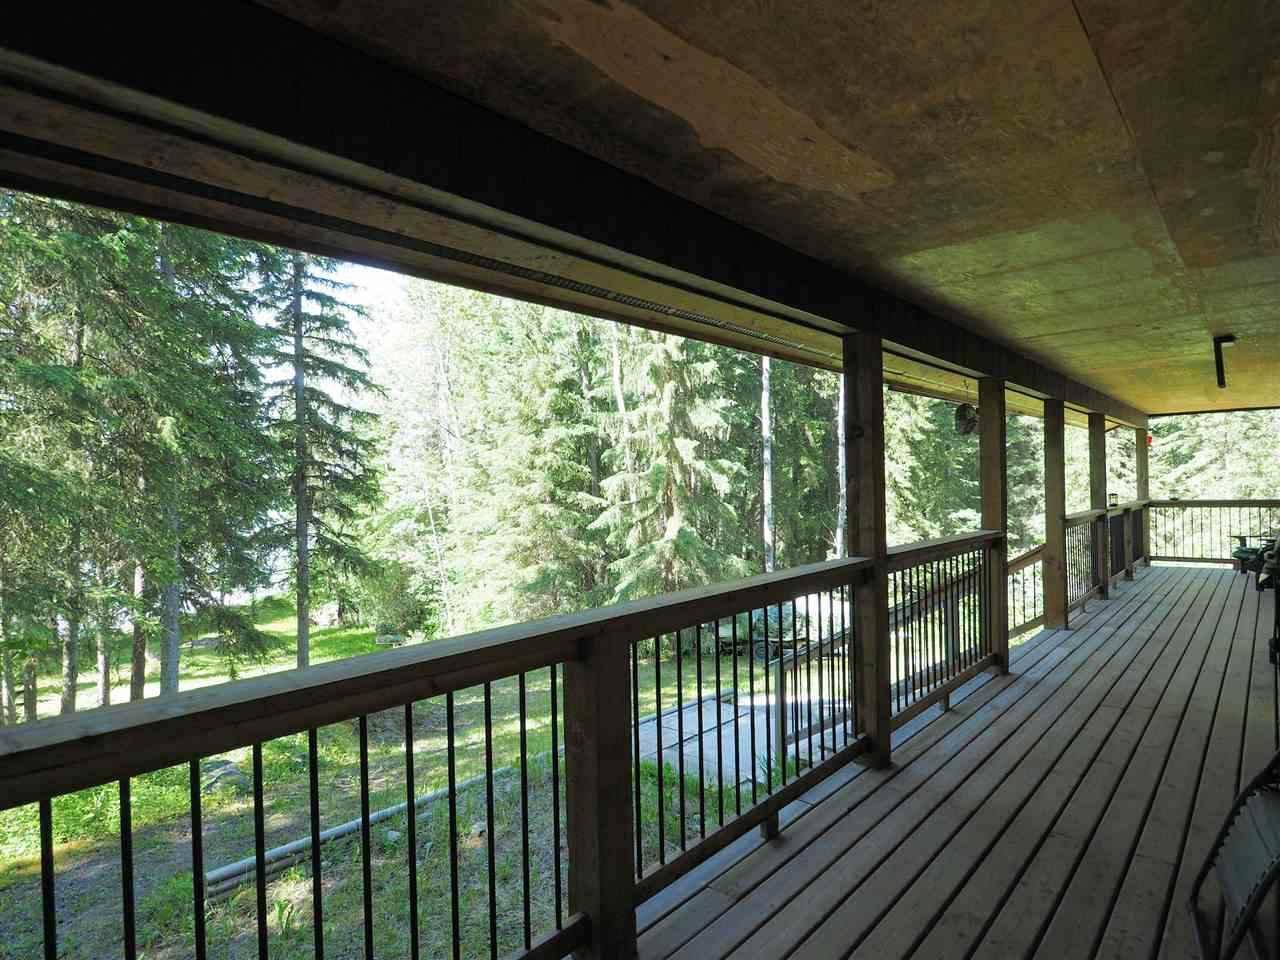 Photo 33: Photos: 8222 CENTENNIAL Road in Bridge Lake: Bridge Lake/Sheridan Lake House for sale (100 Mile House (Zone 10))  : MLS®# R2457362